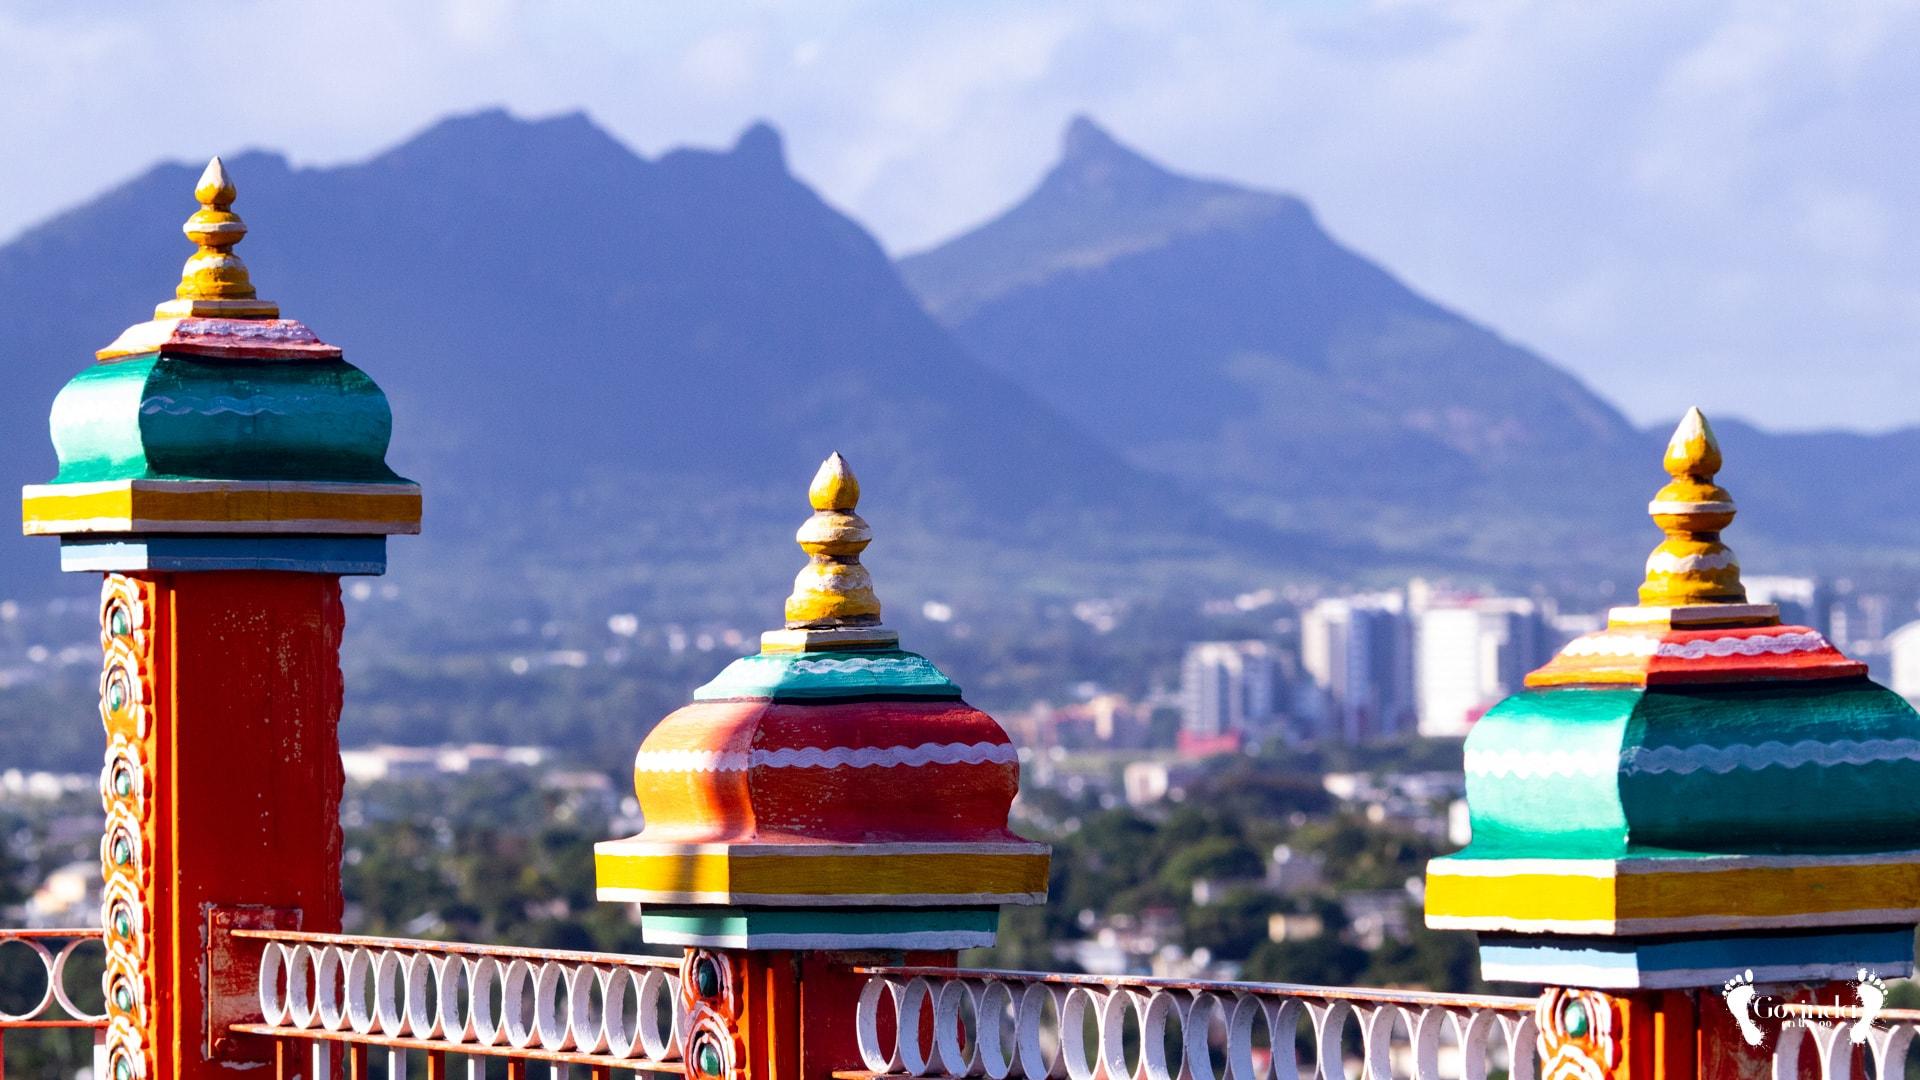 View from Vela Murugan temple in Mauritius